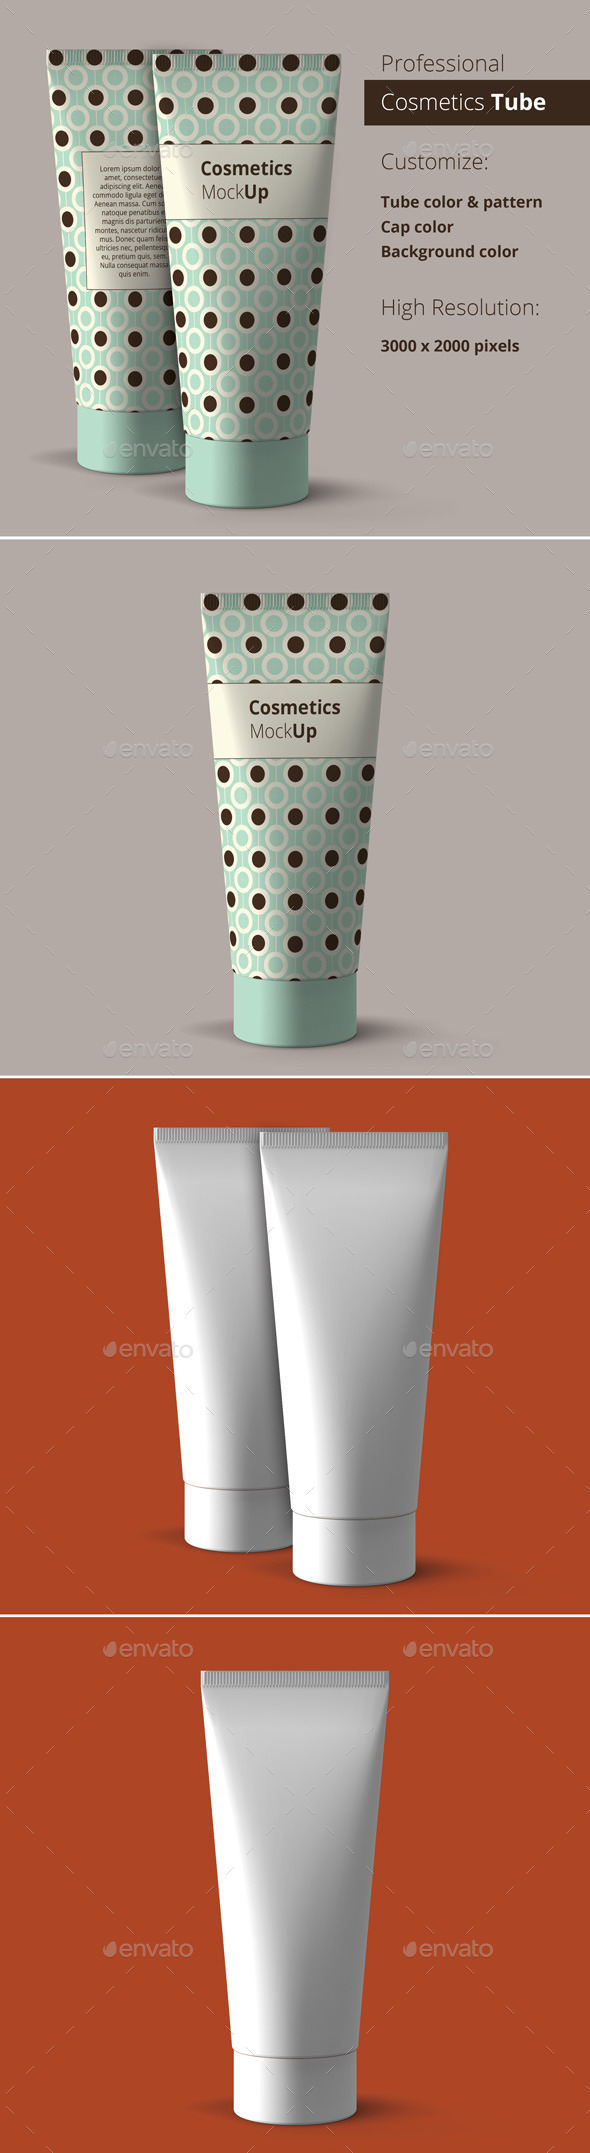 Cosmetics Tube Mockup - Beauty Packaging